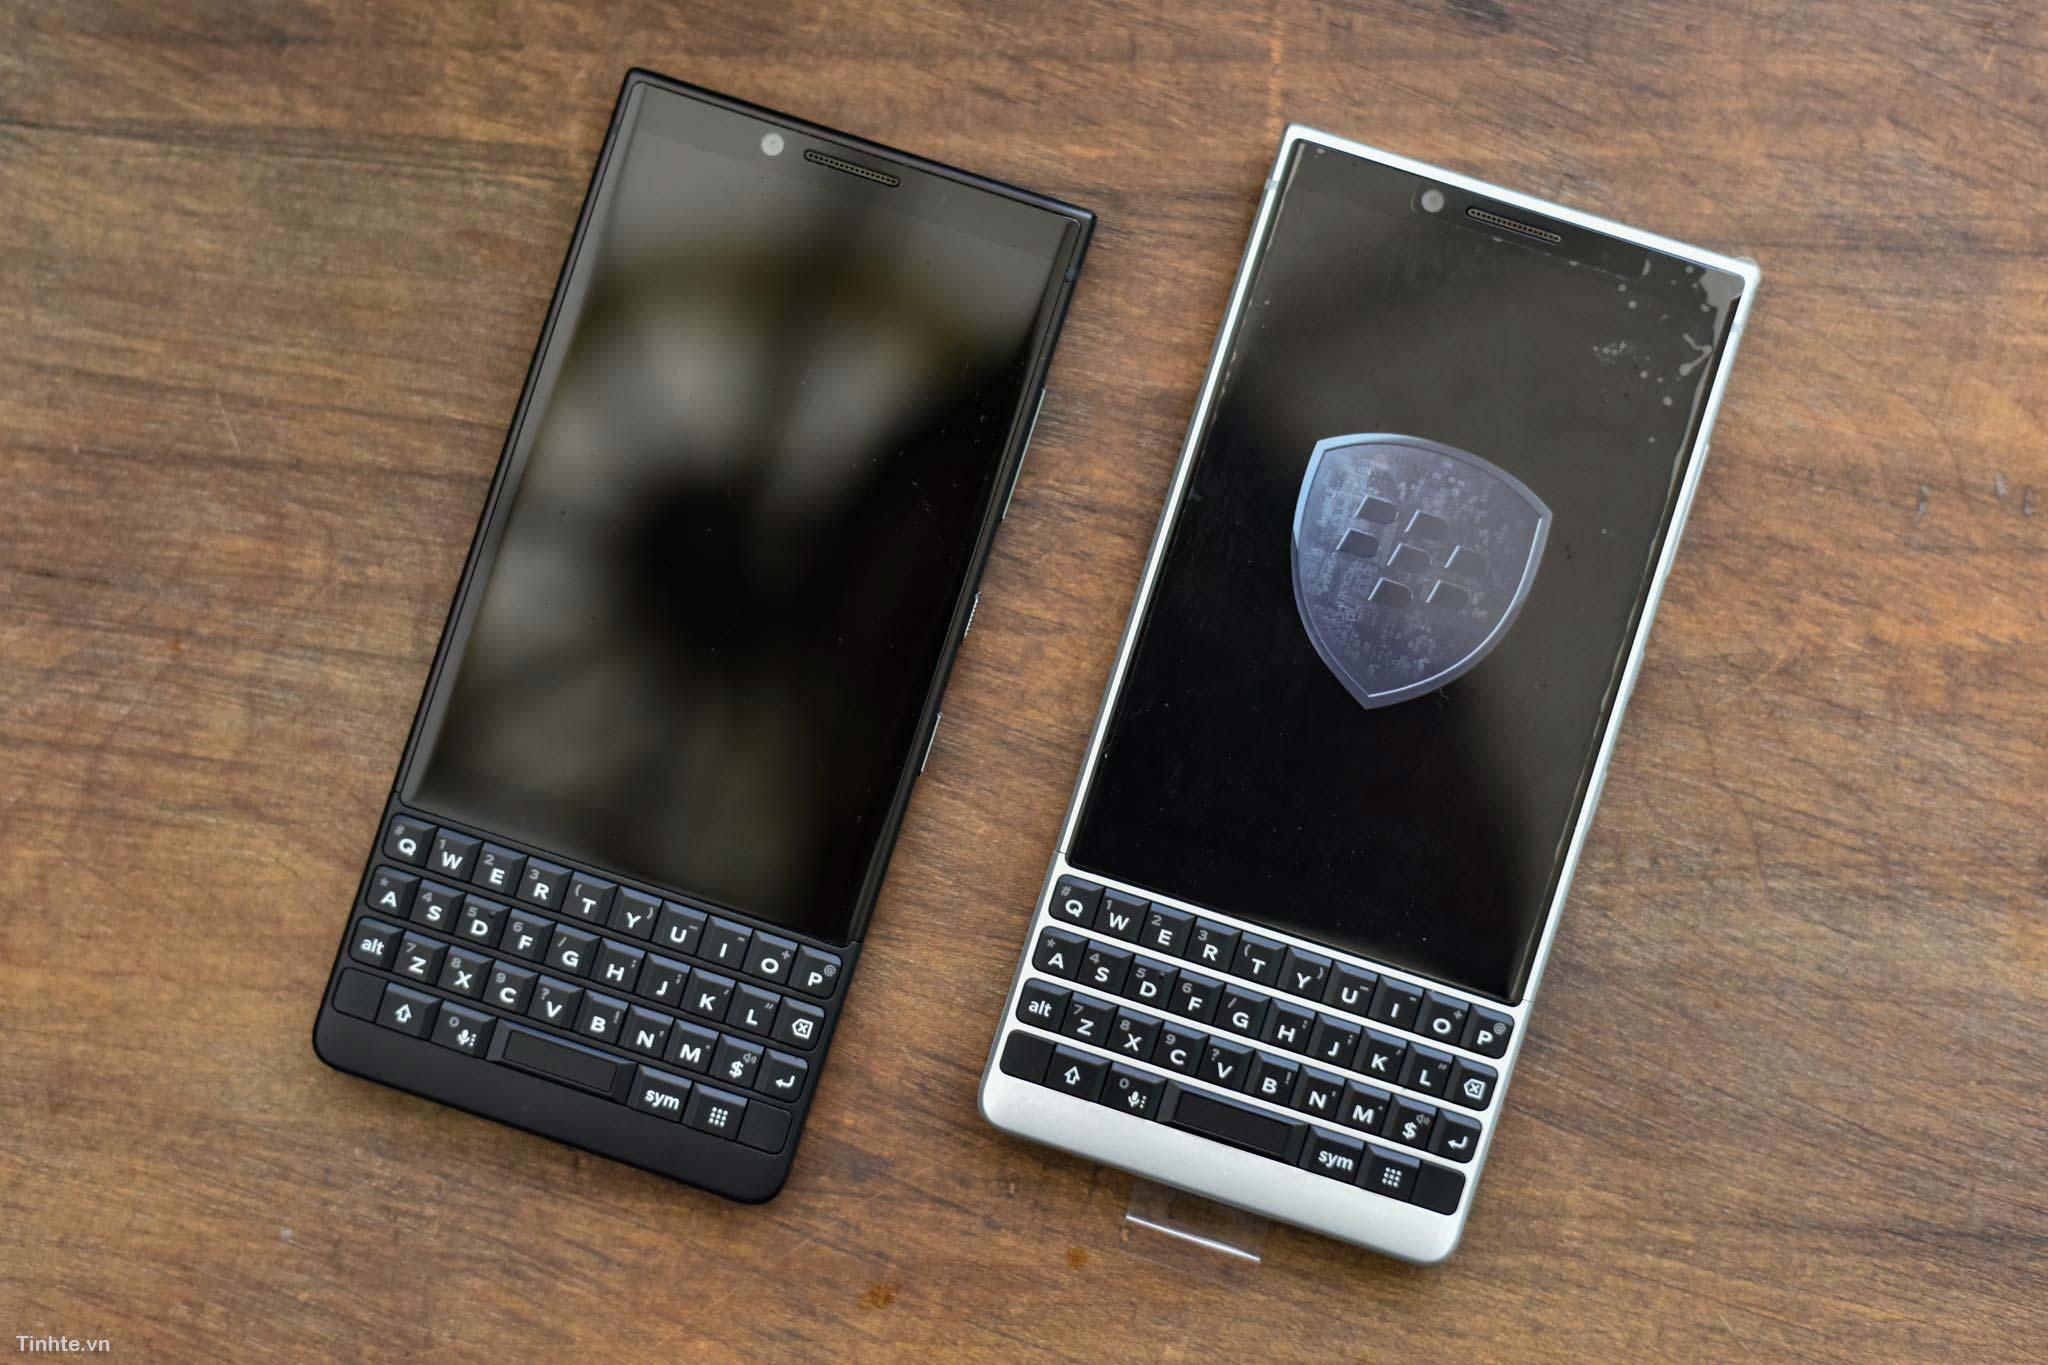 BlackBerry_KEY2_mo-hop_tinhte_1.jpg